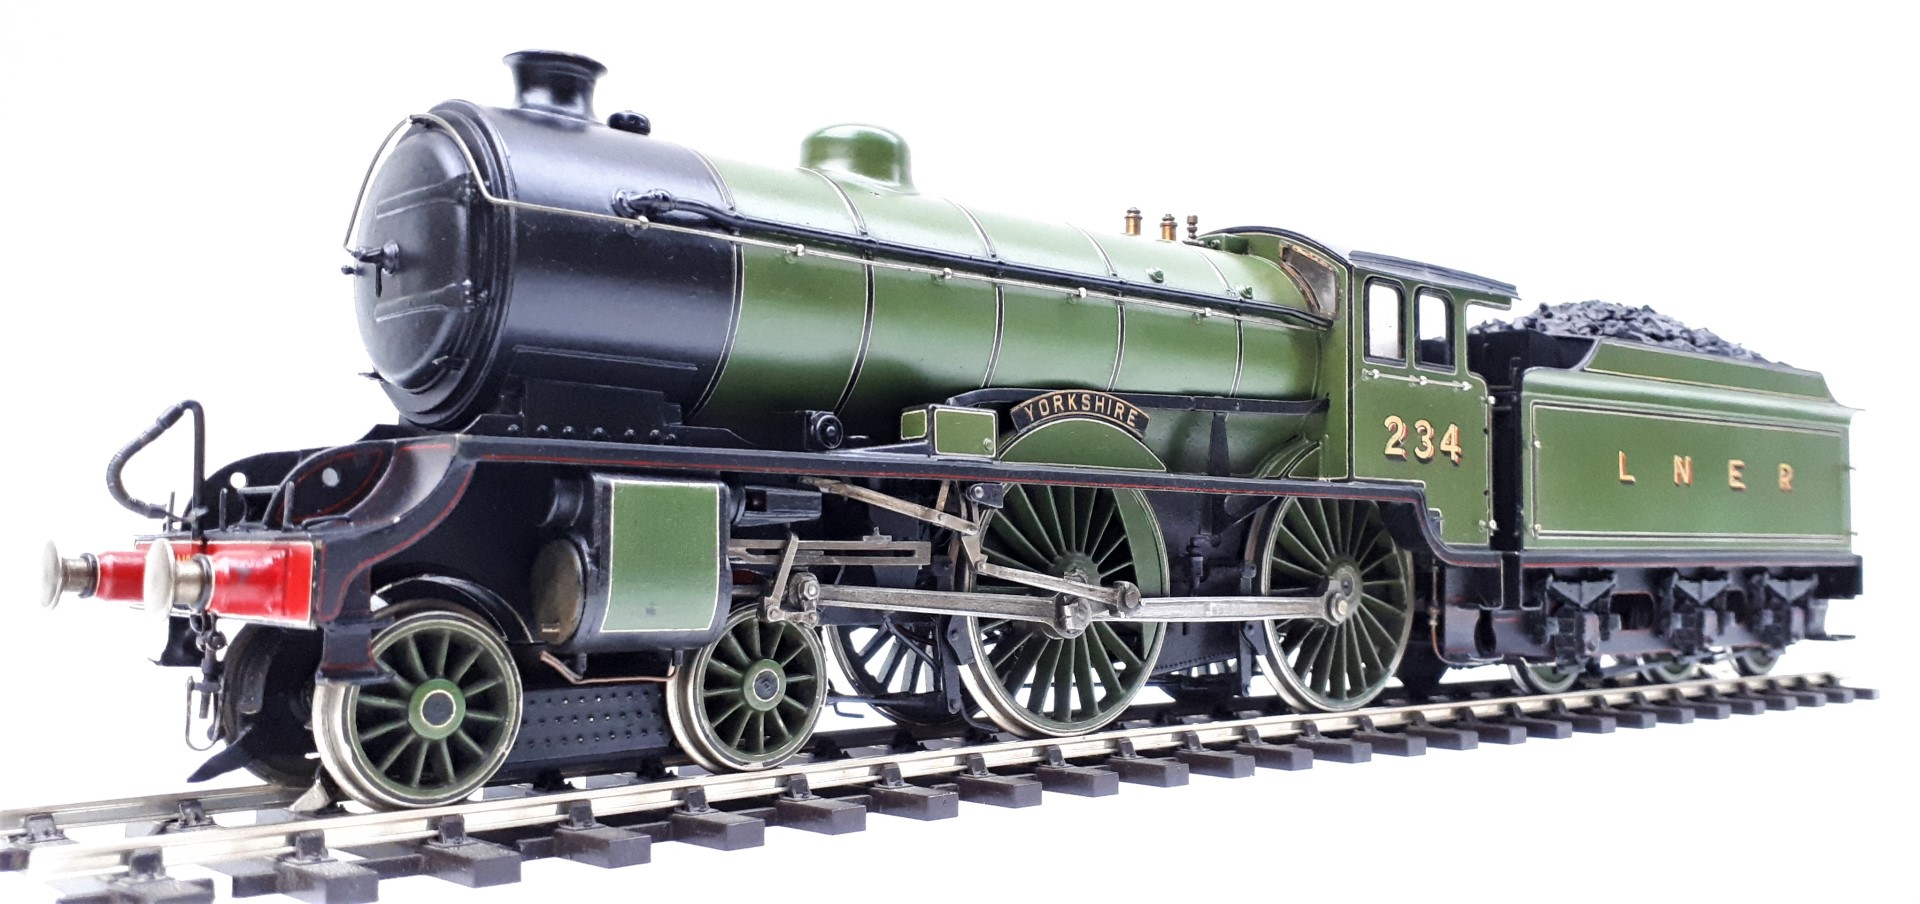 234 Yorkshire